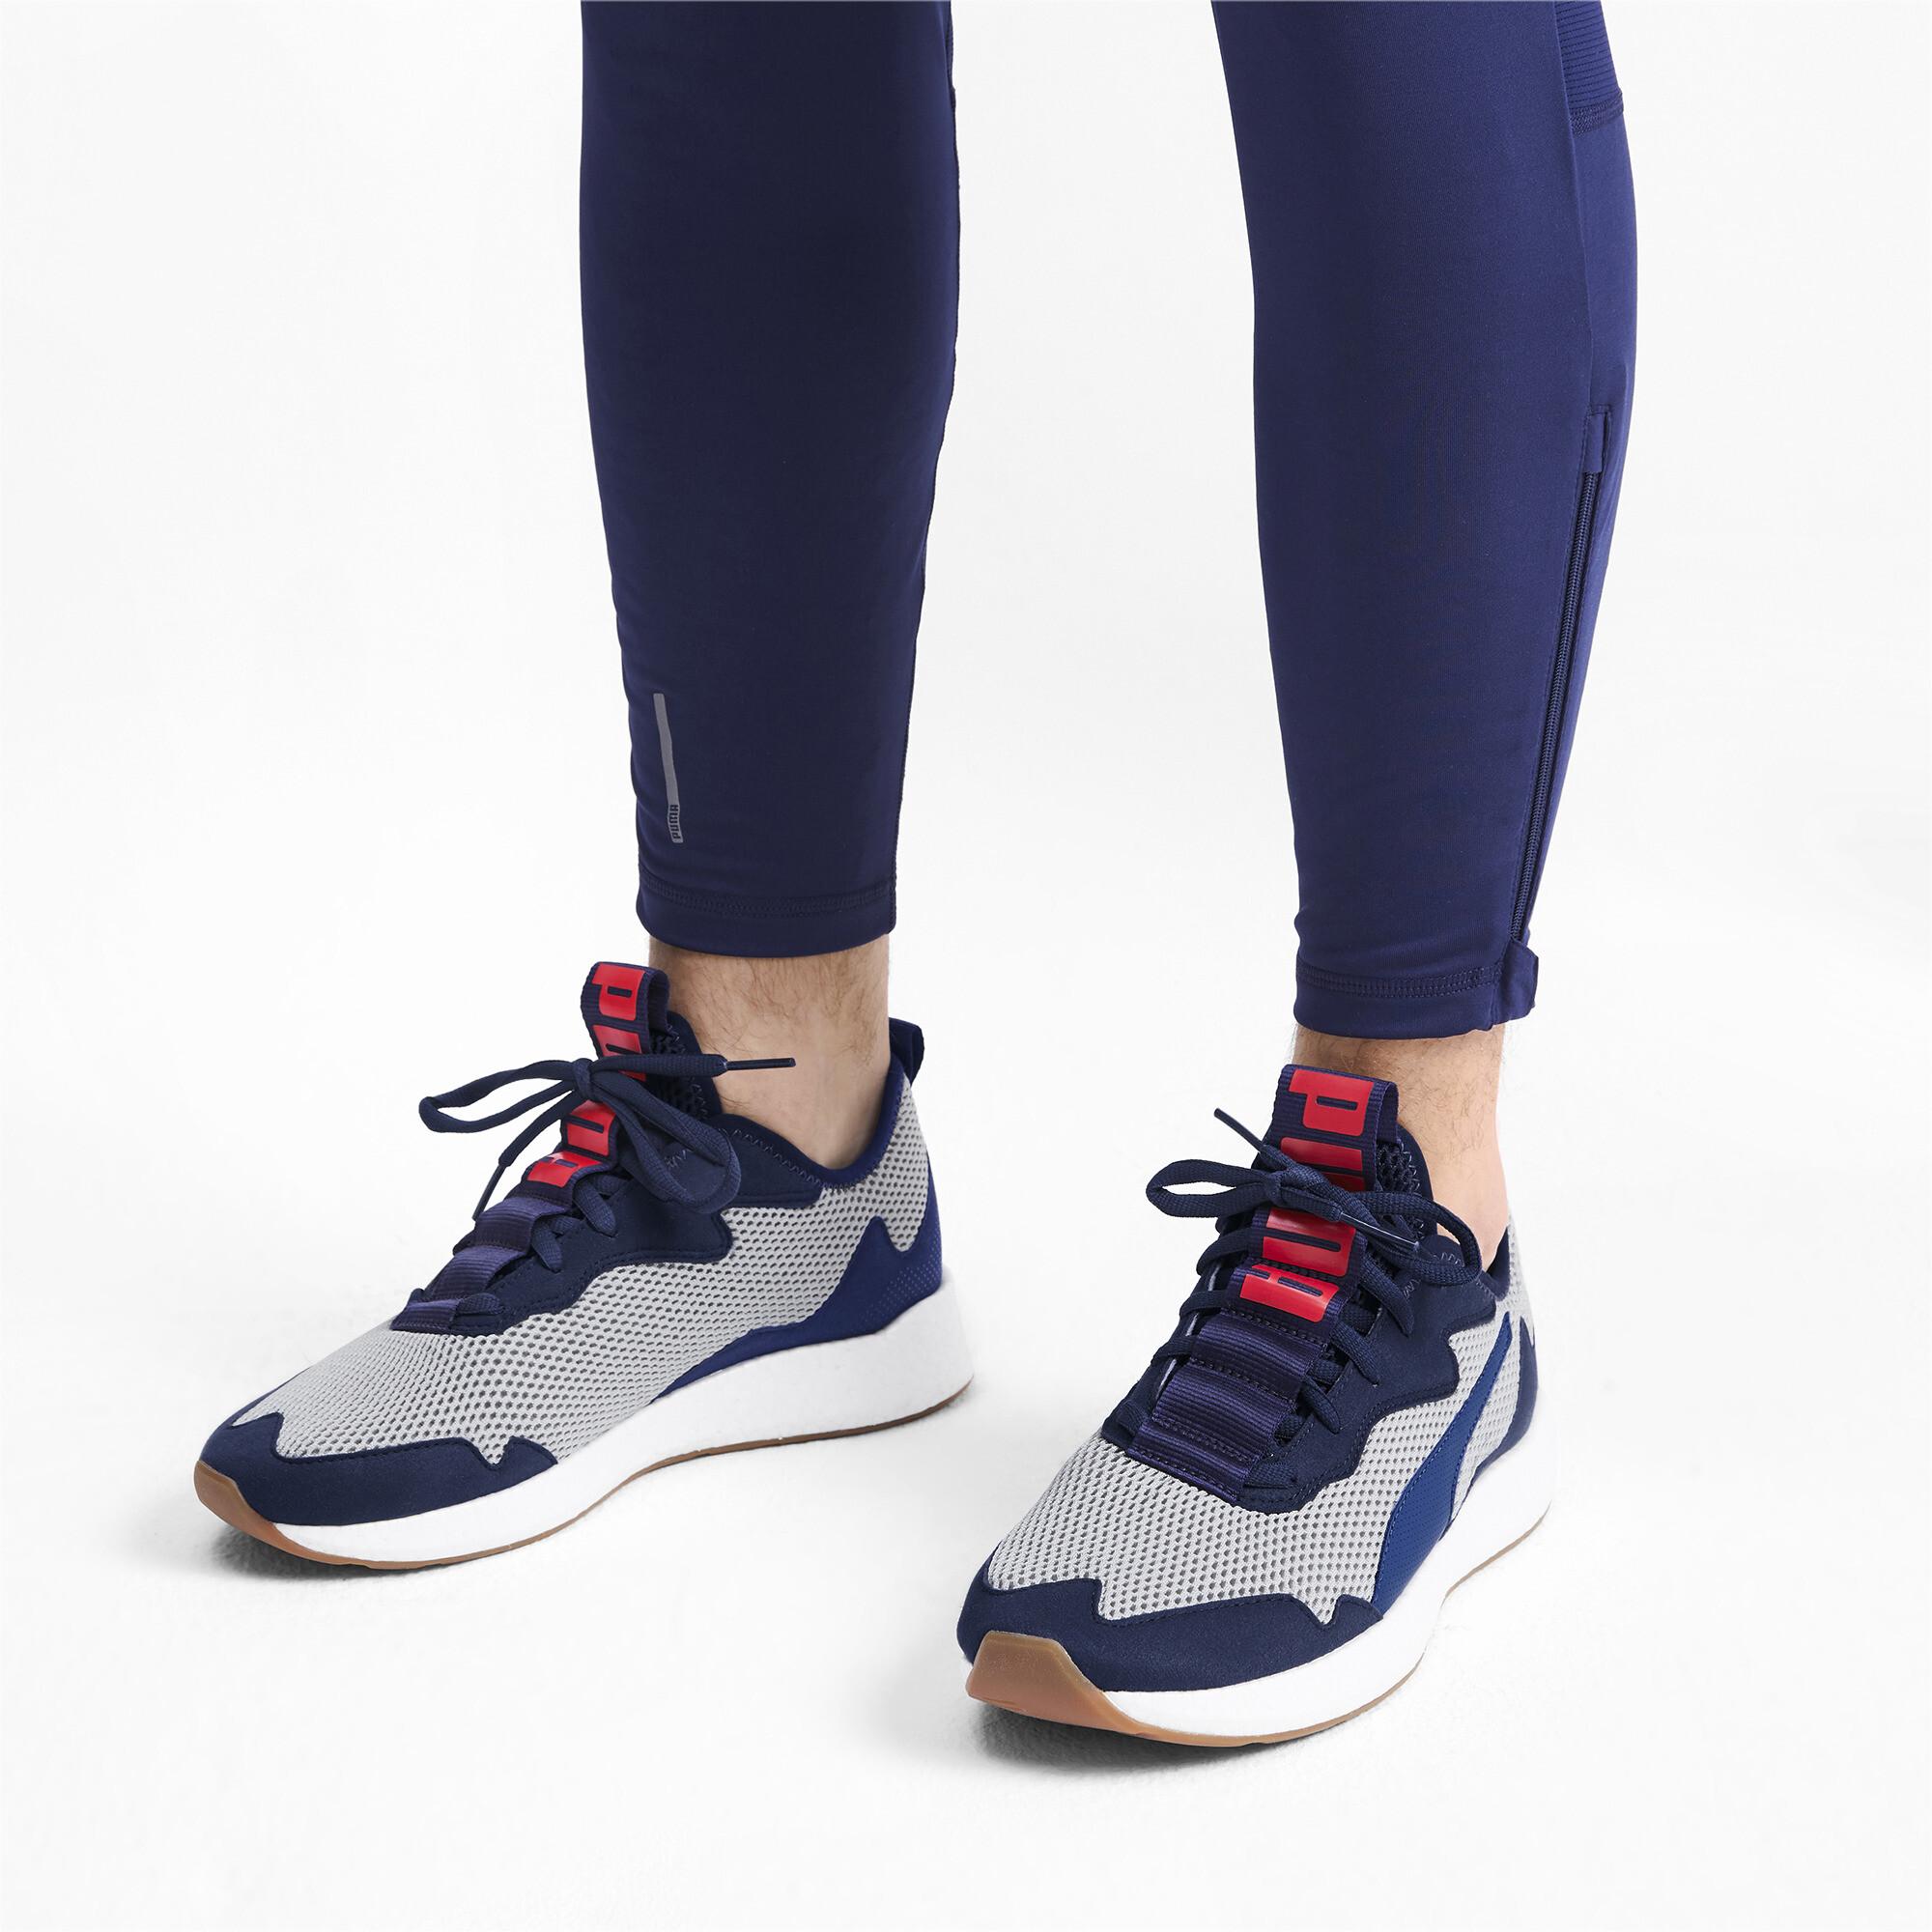 PUMA-NRGY-Neko-Skim-Men-s-Running-Shoes-Men-Shoe-Running thumbnail 15